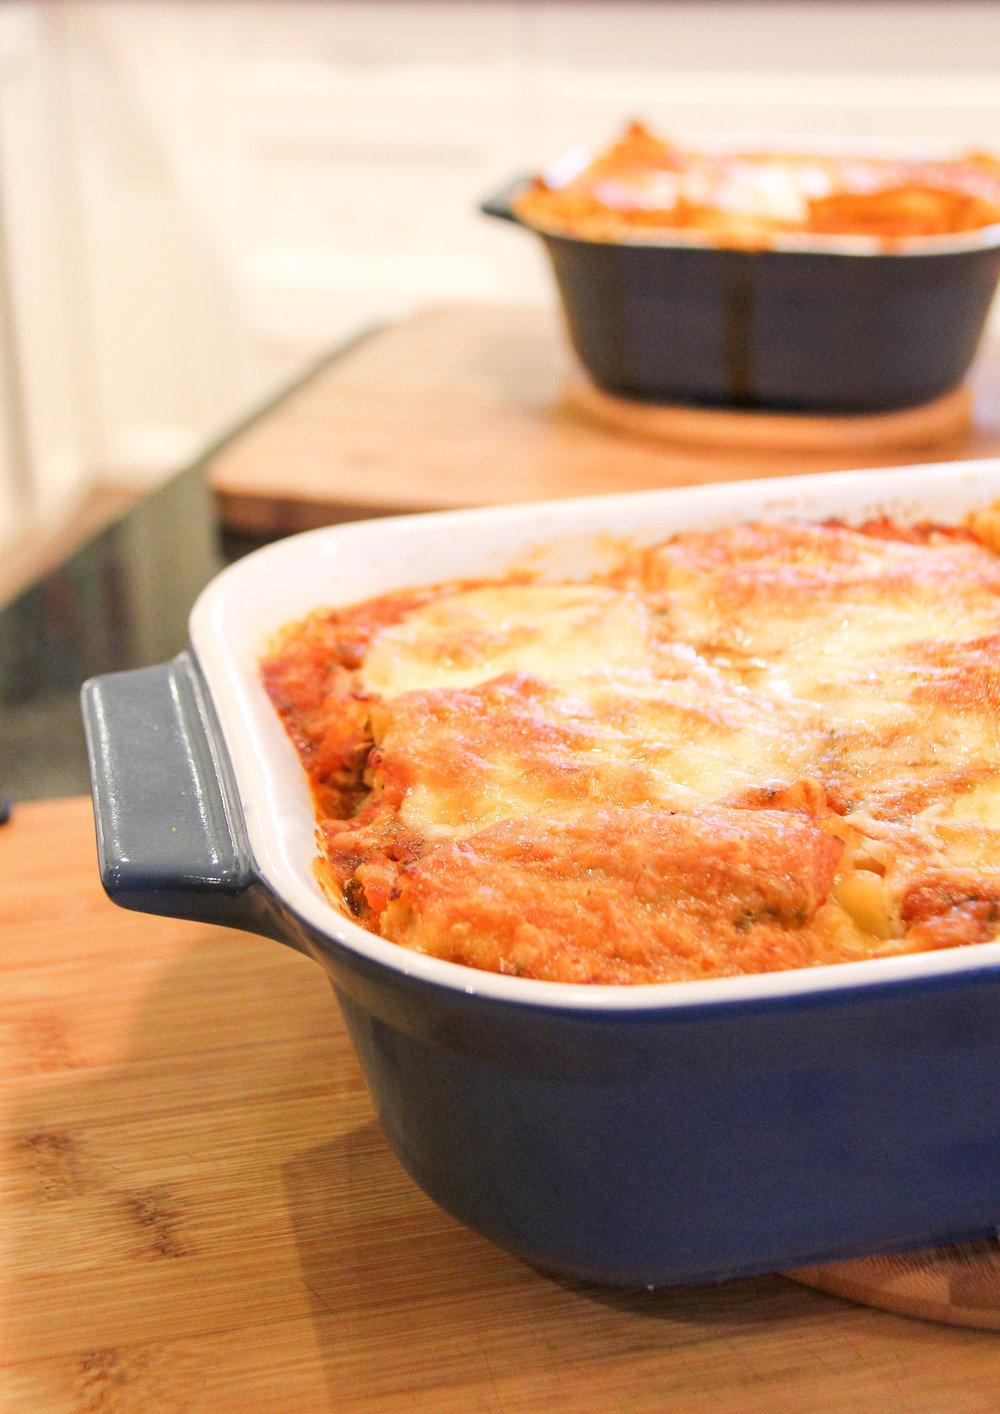 Top pan - traditional layers, bottom pan - roll ups